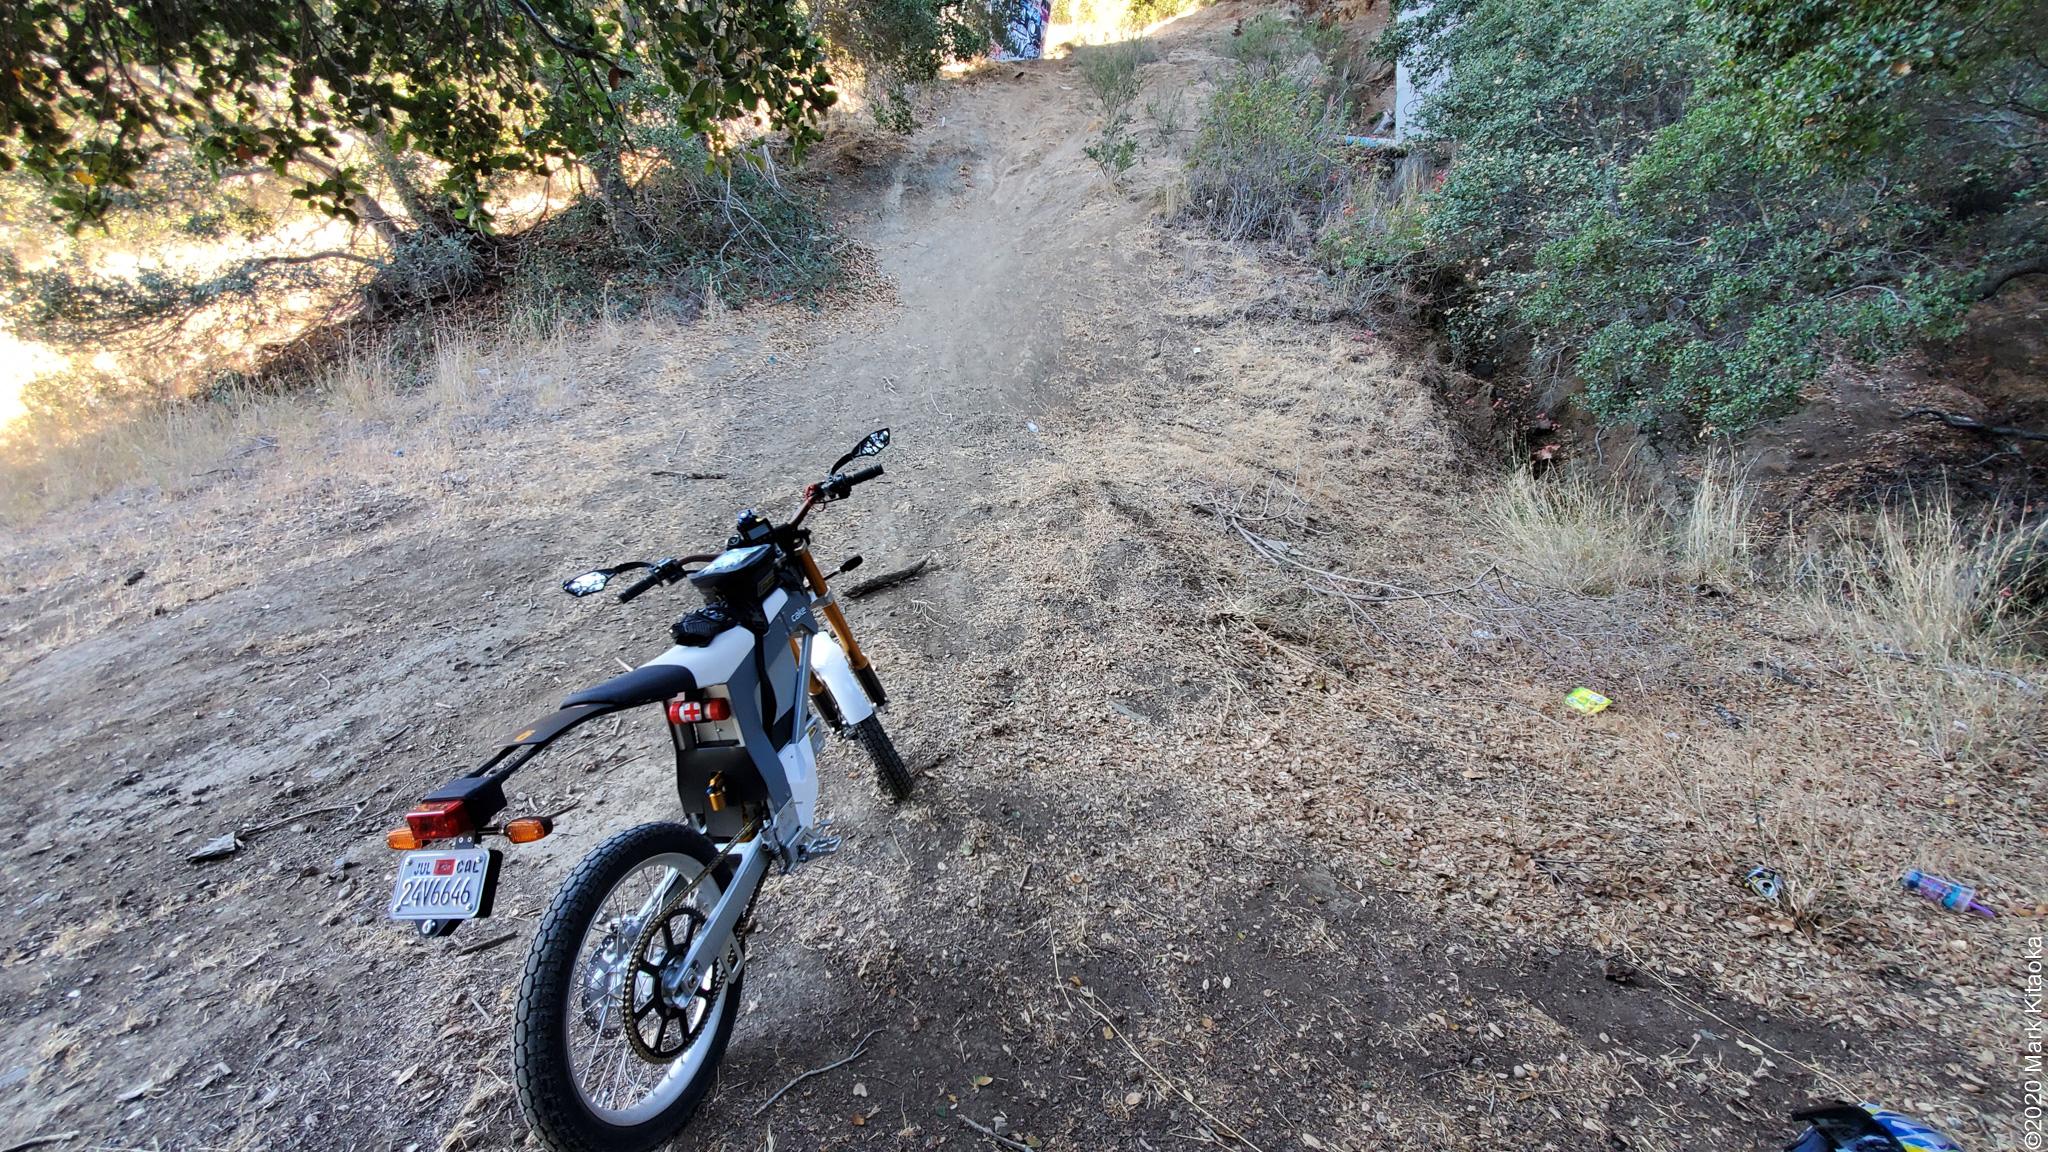 Kalk motorcycle on dirt path